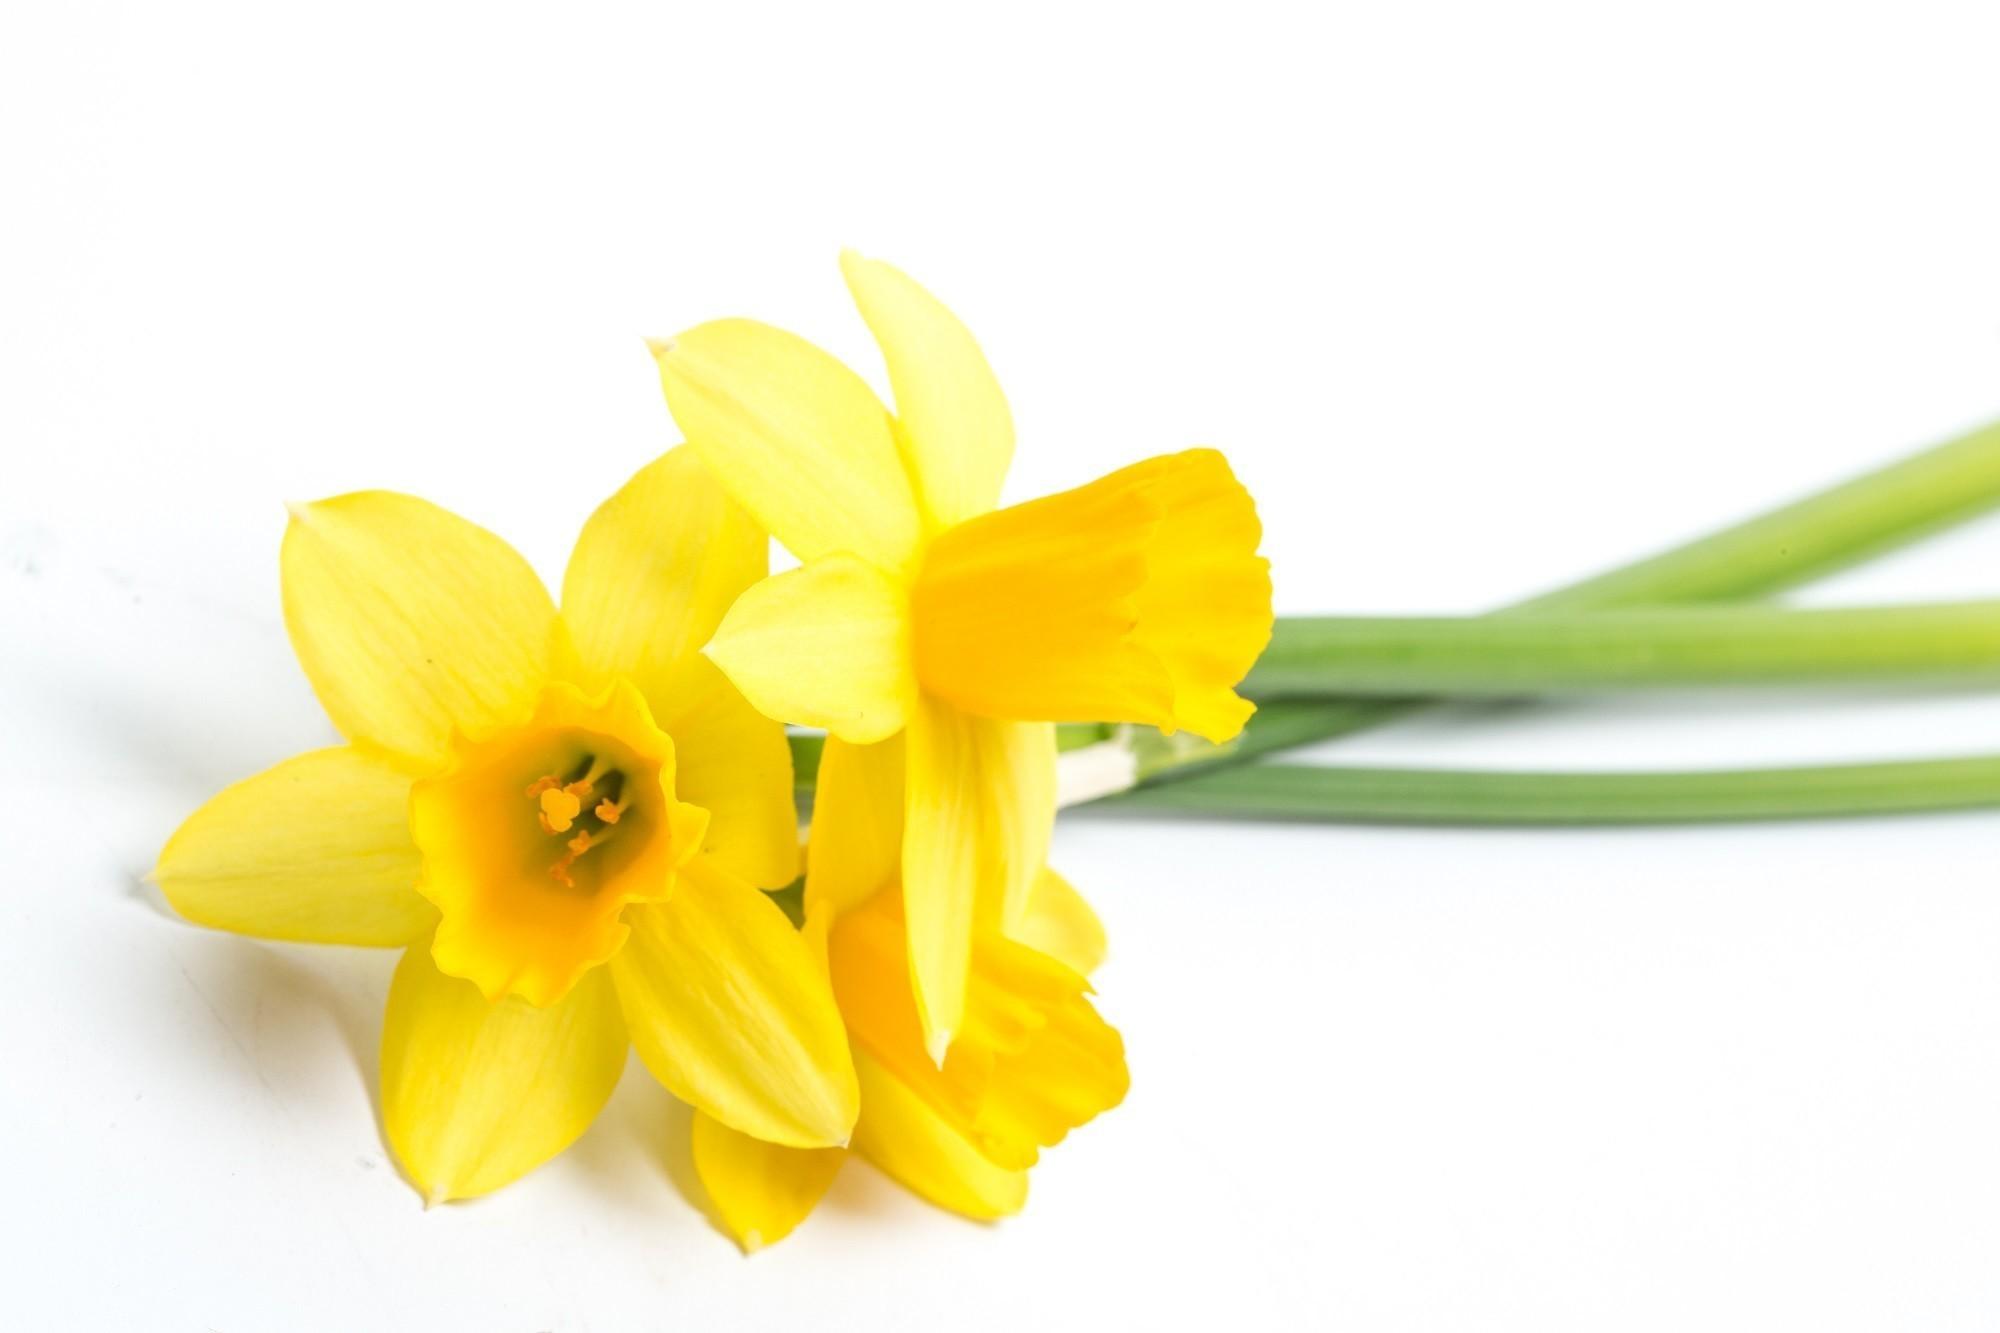 daffodil day - photo #39